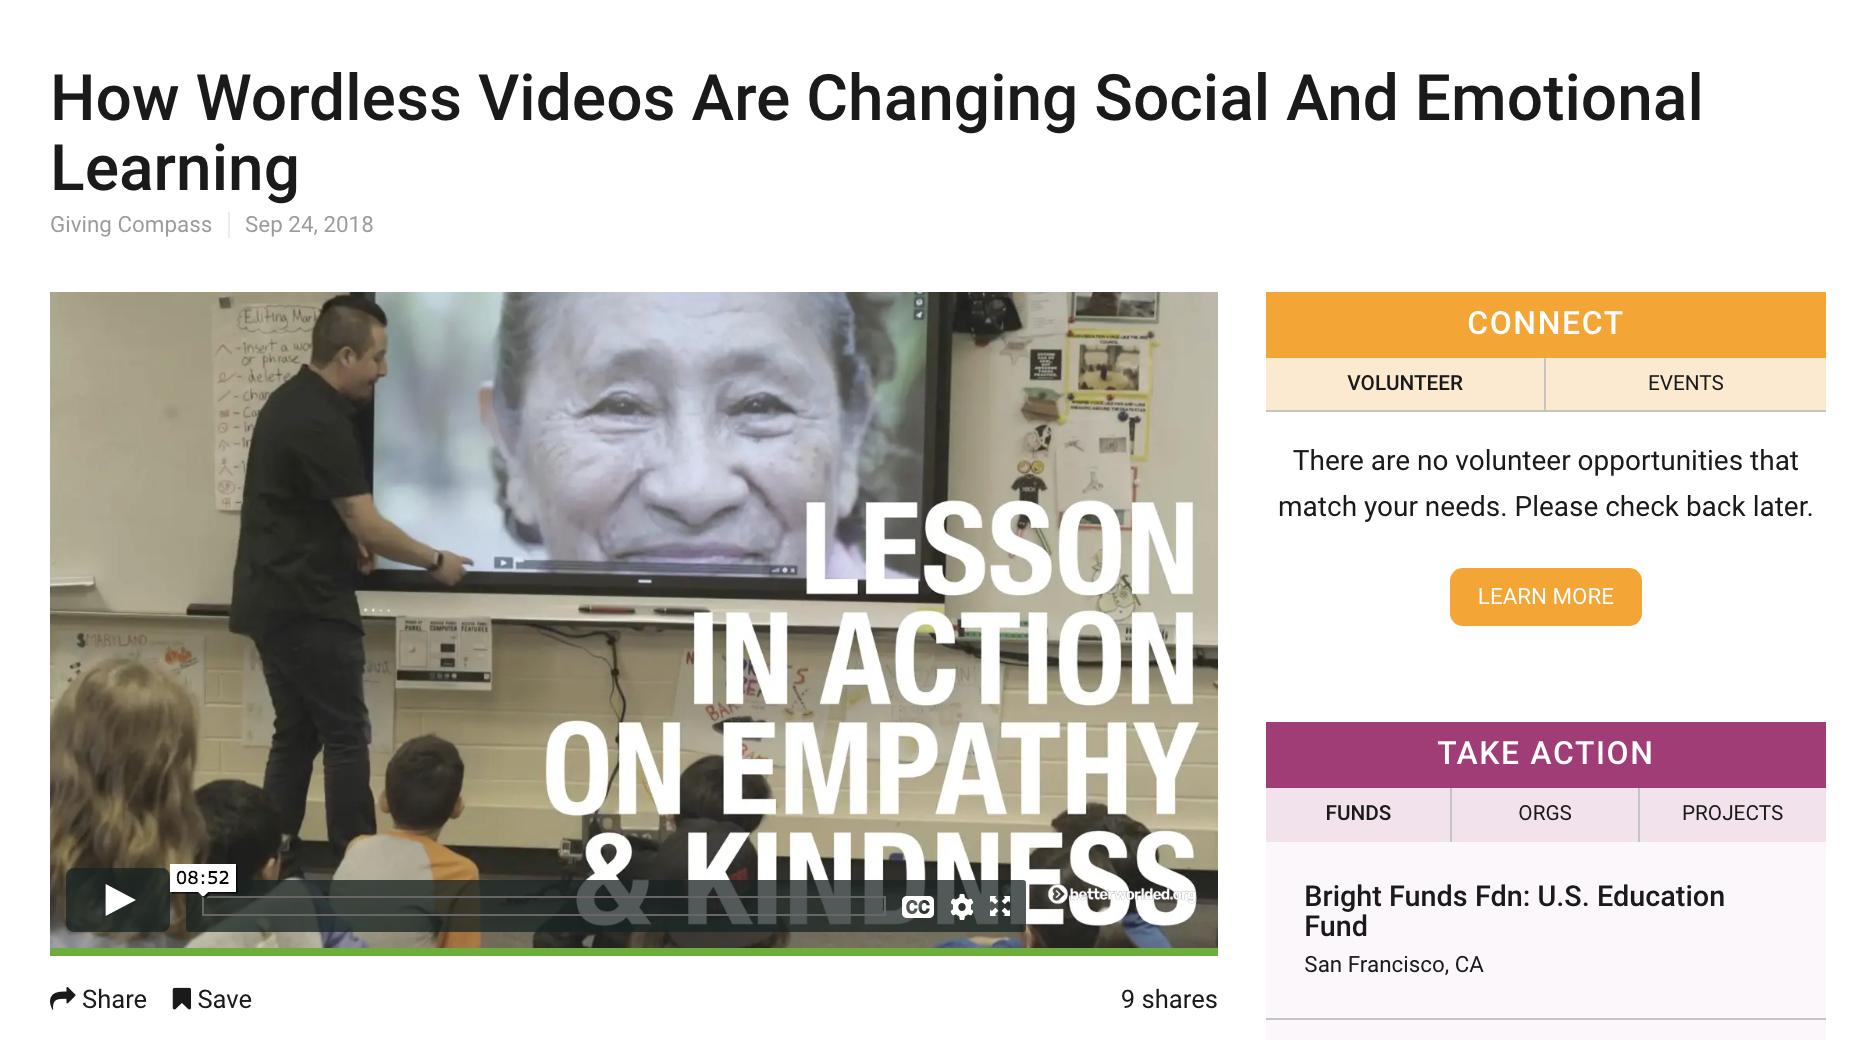 educational media for social emotional learning that's global